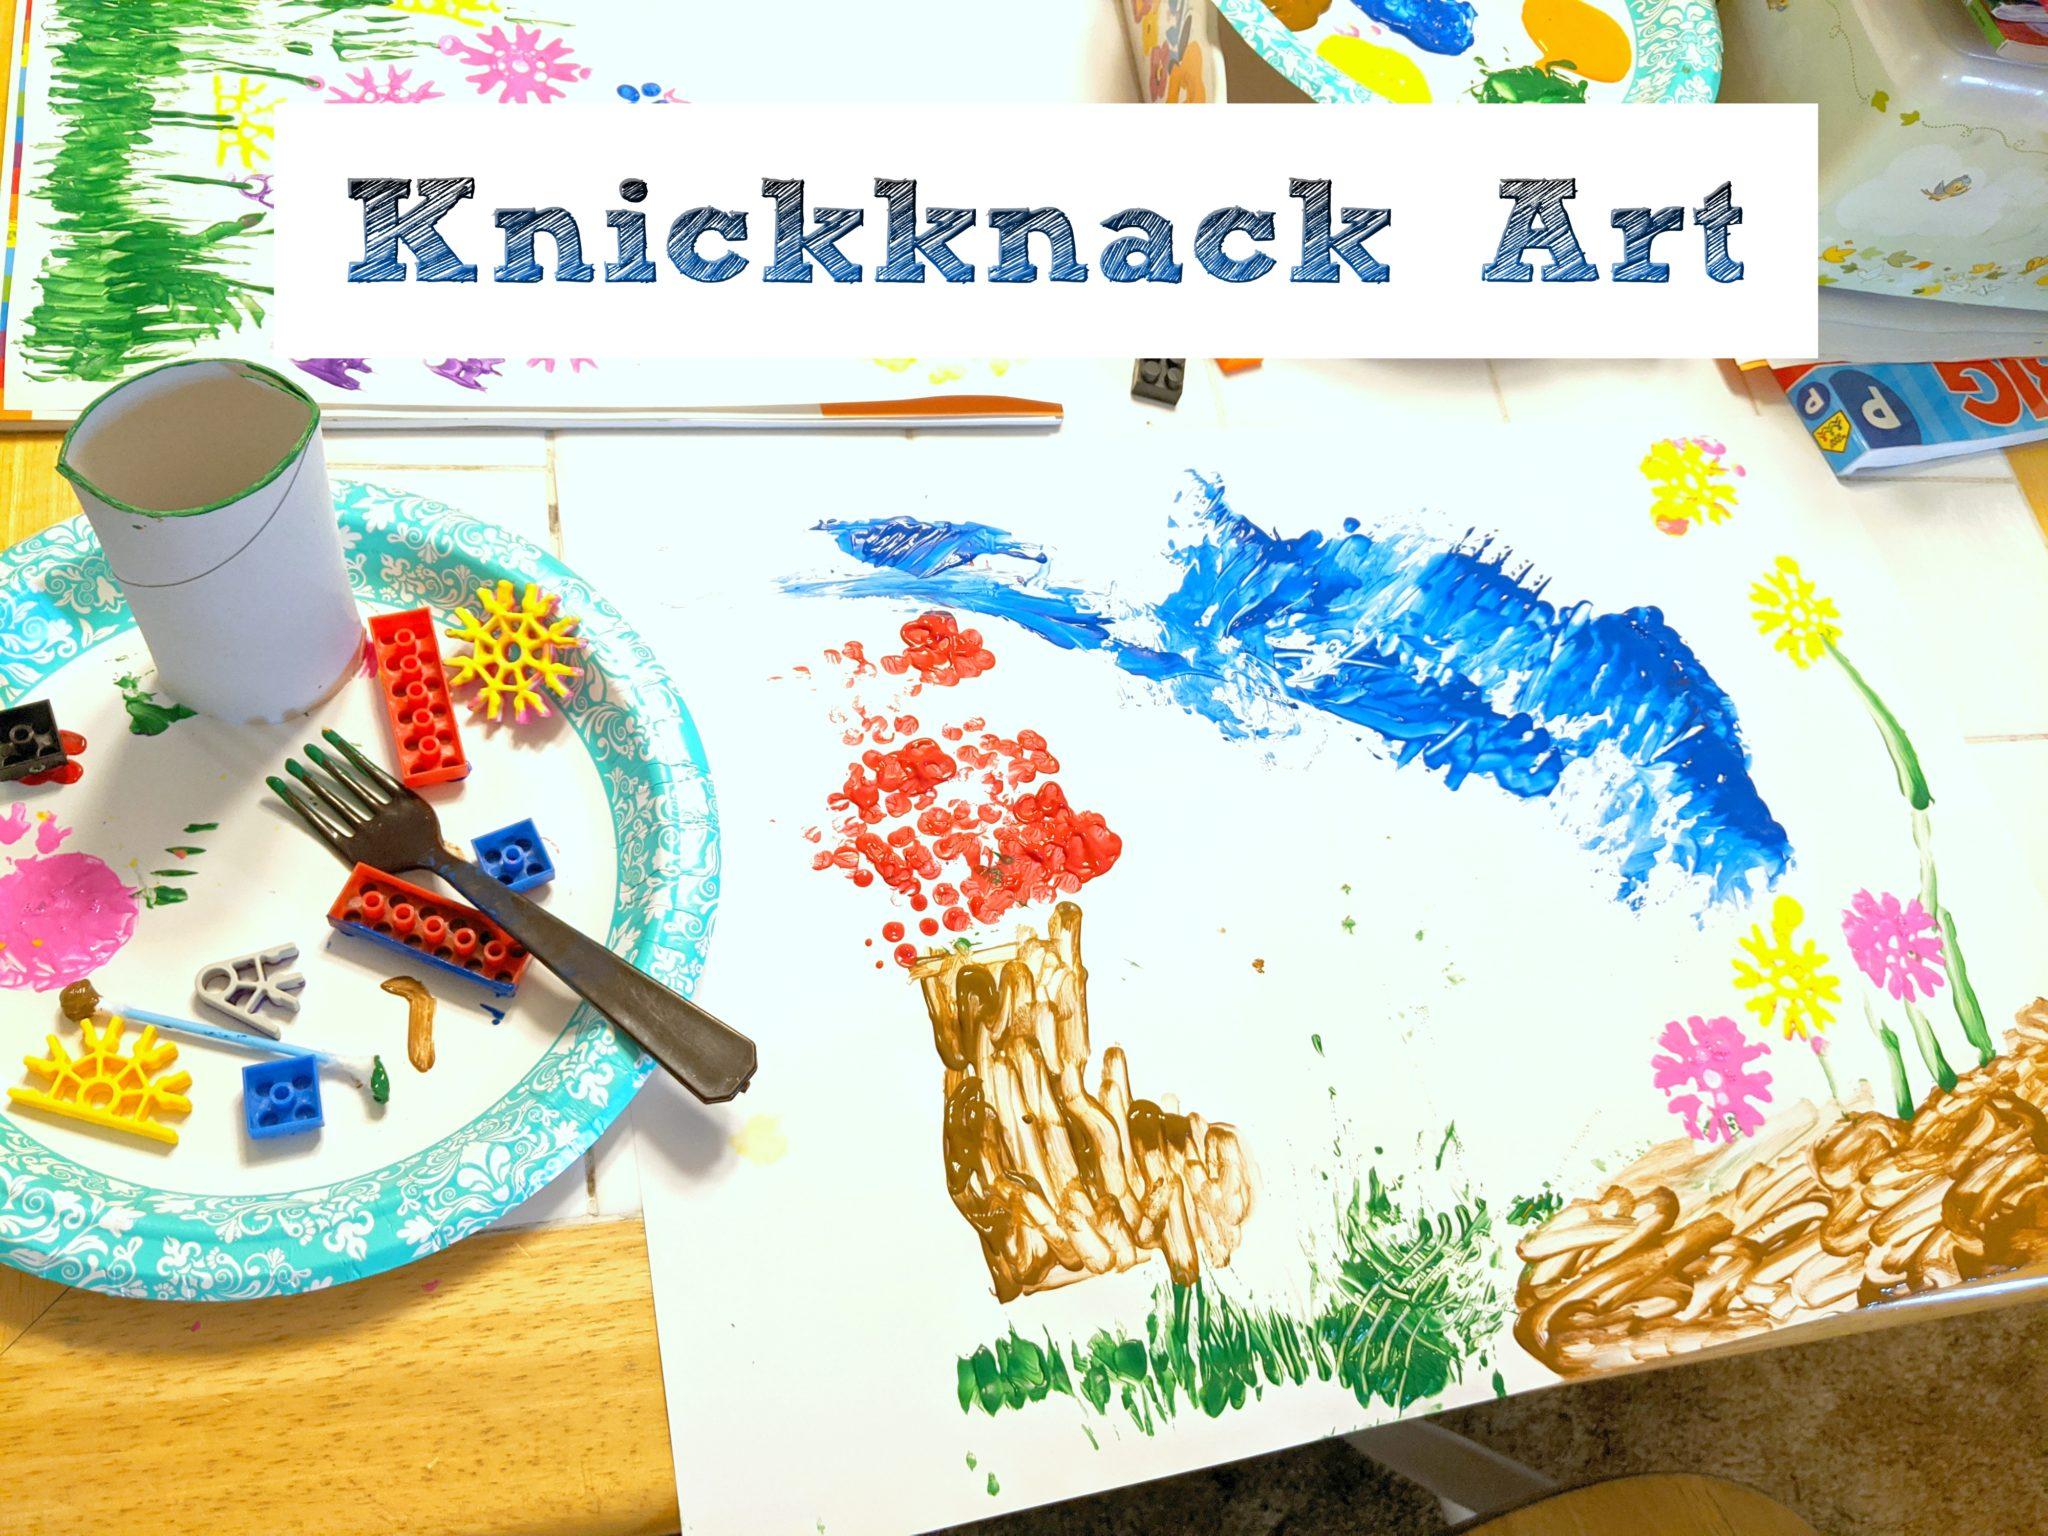 Knickknack Art